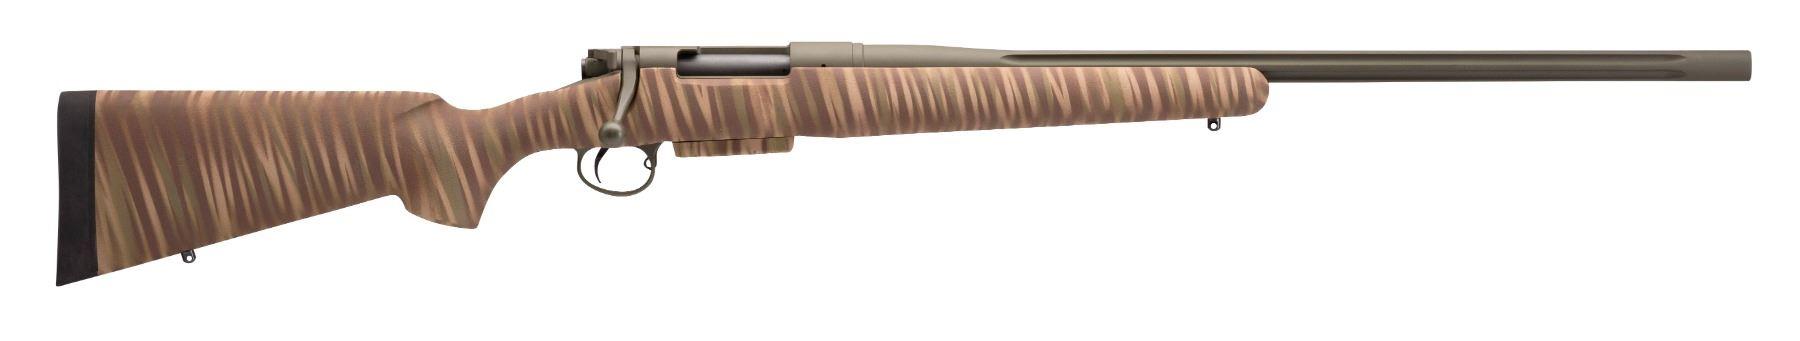 H-S PRECISION Sporter Lightweight Hunting Rifle in .280 Remington and Swarovski Z5i 3.5-18x44 Scope